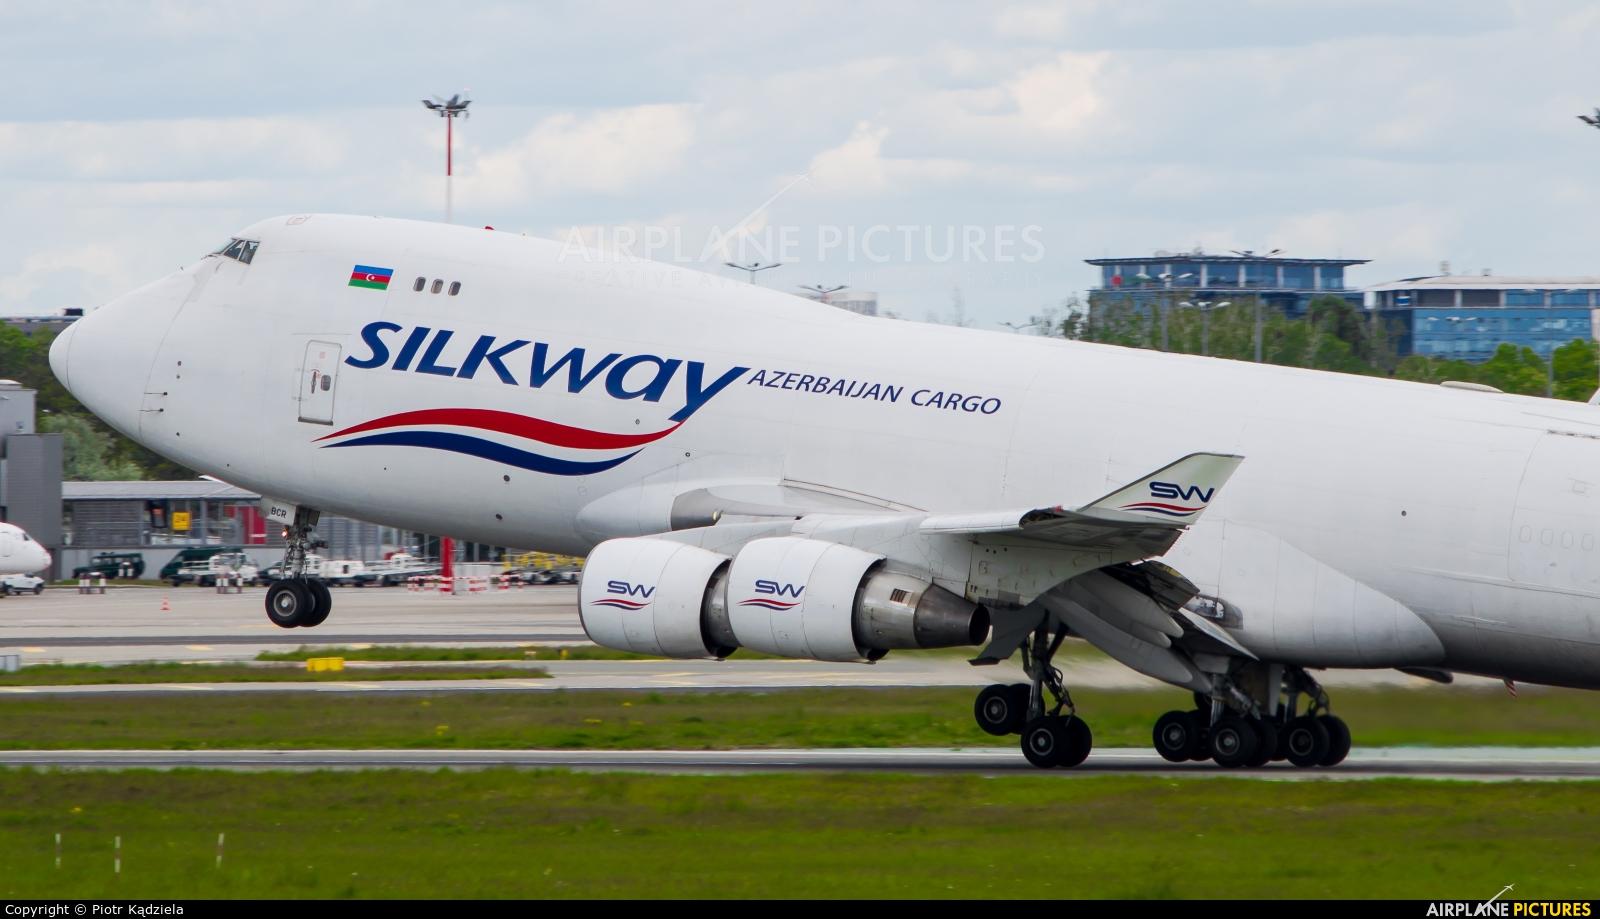 Silk Way Airlines VP-BCR aircraft at Warsaw - Frederic Chopin